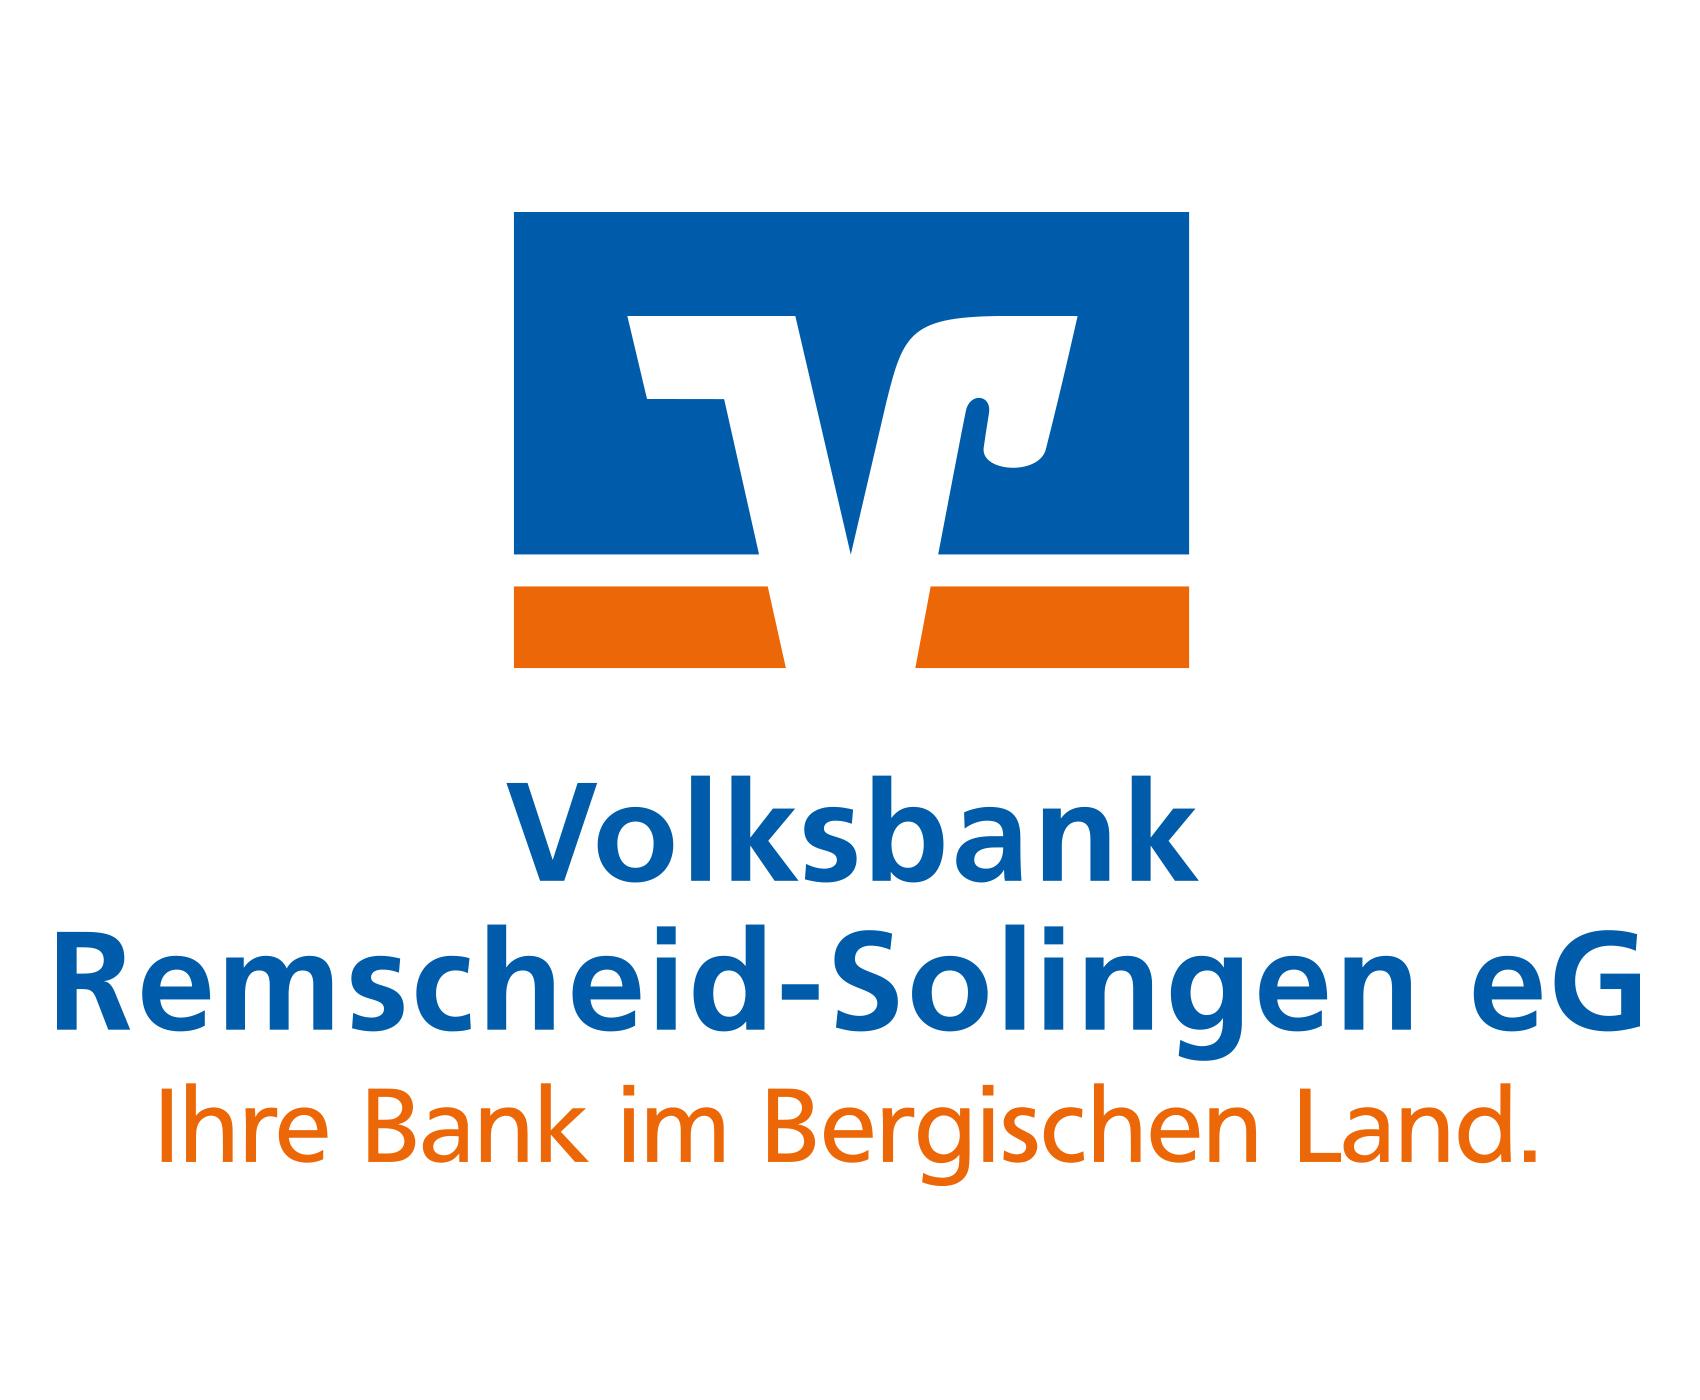 Volksbank Remscheid-Solingen eG